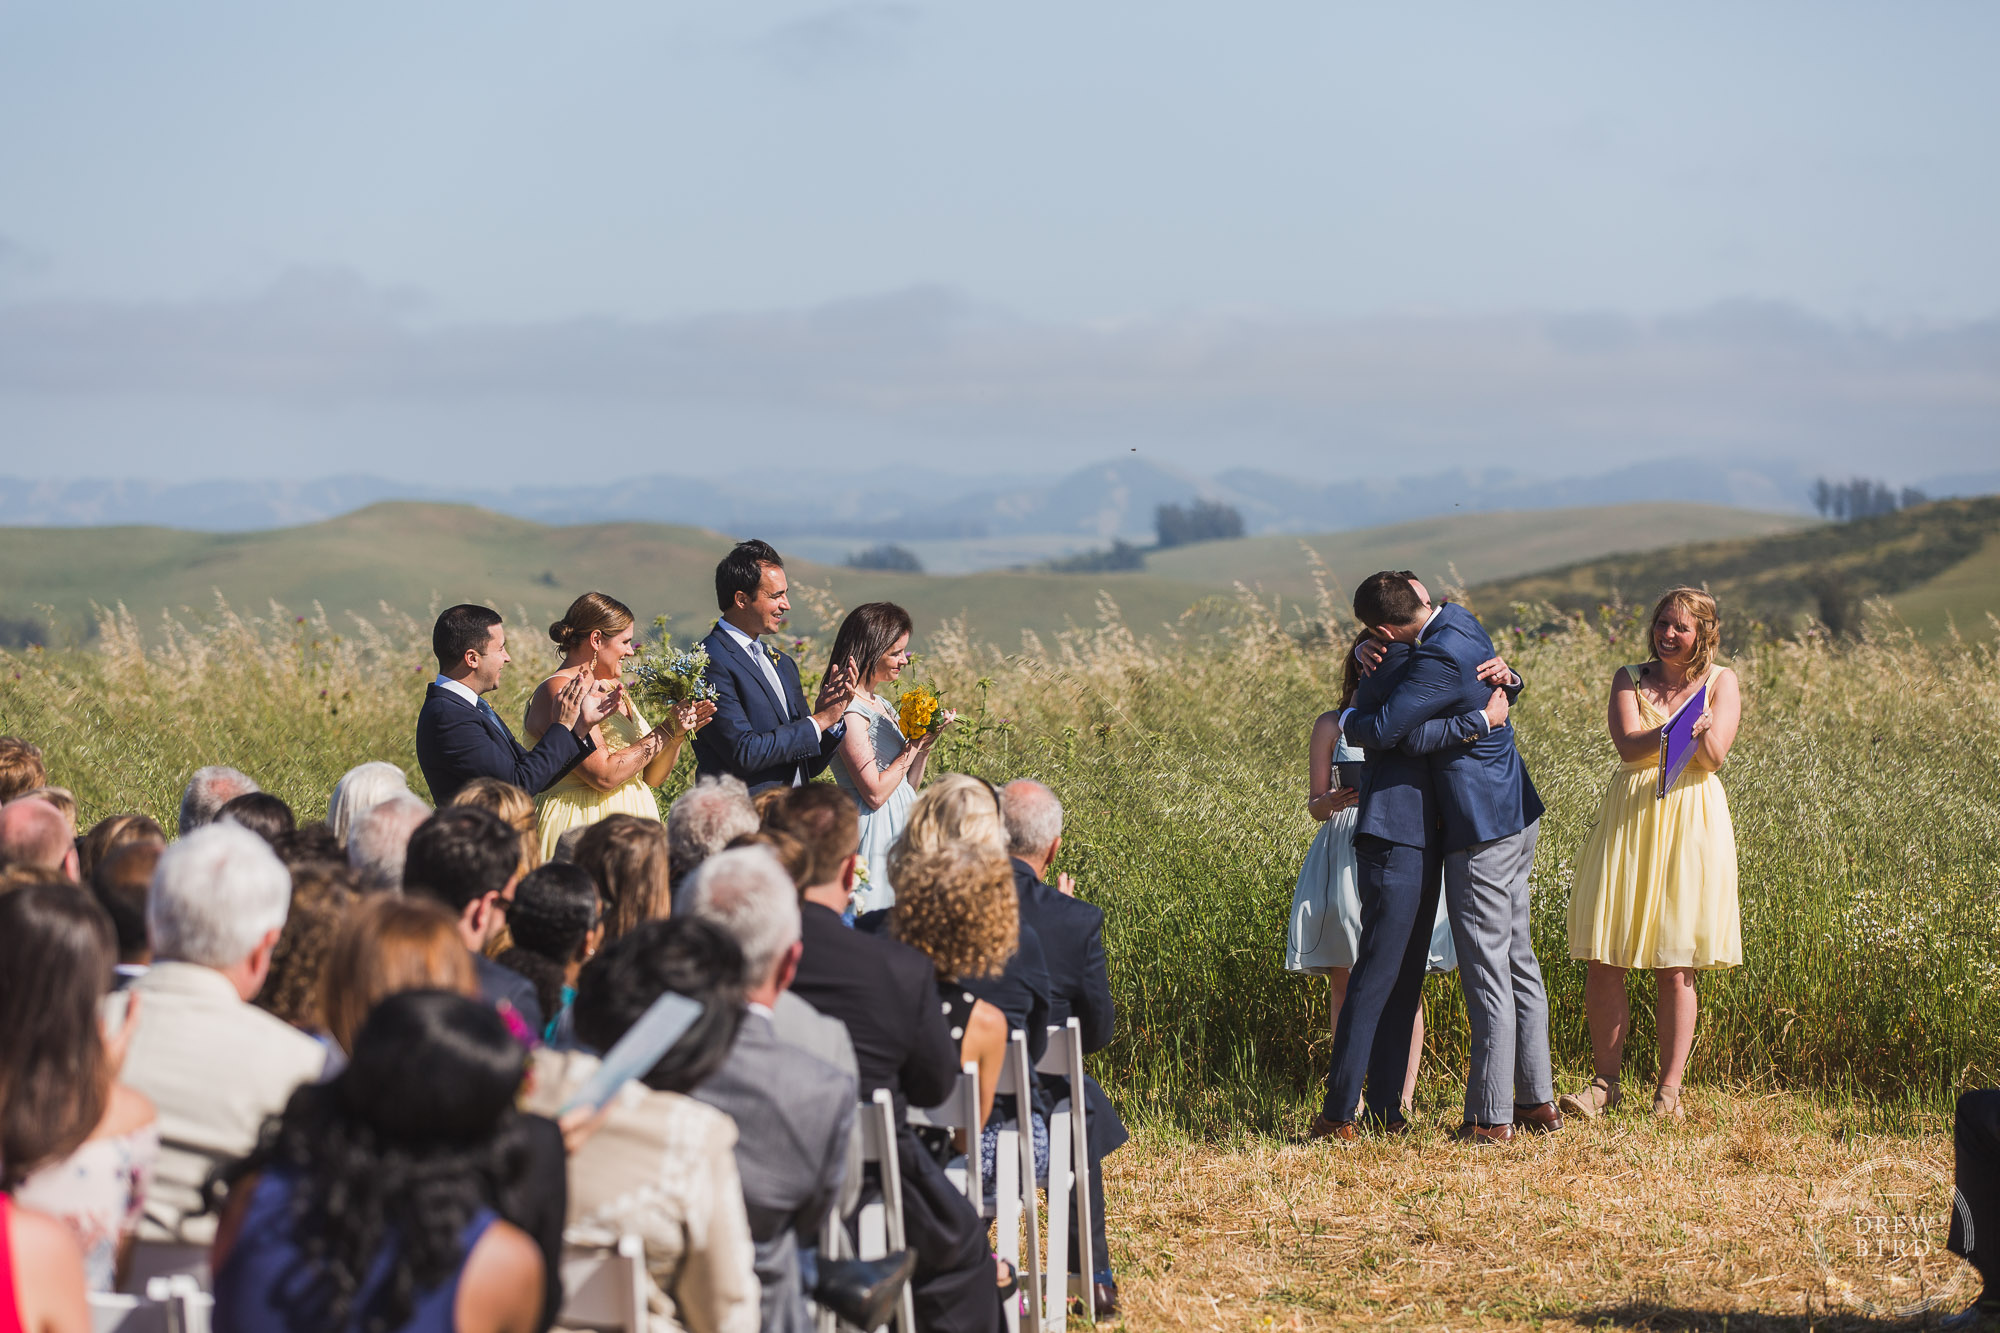 Sonoma Farm Wedding photographer Drew Bird. Gay wedding photographer.